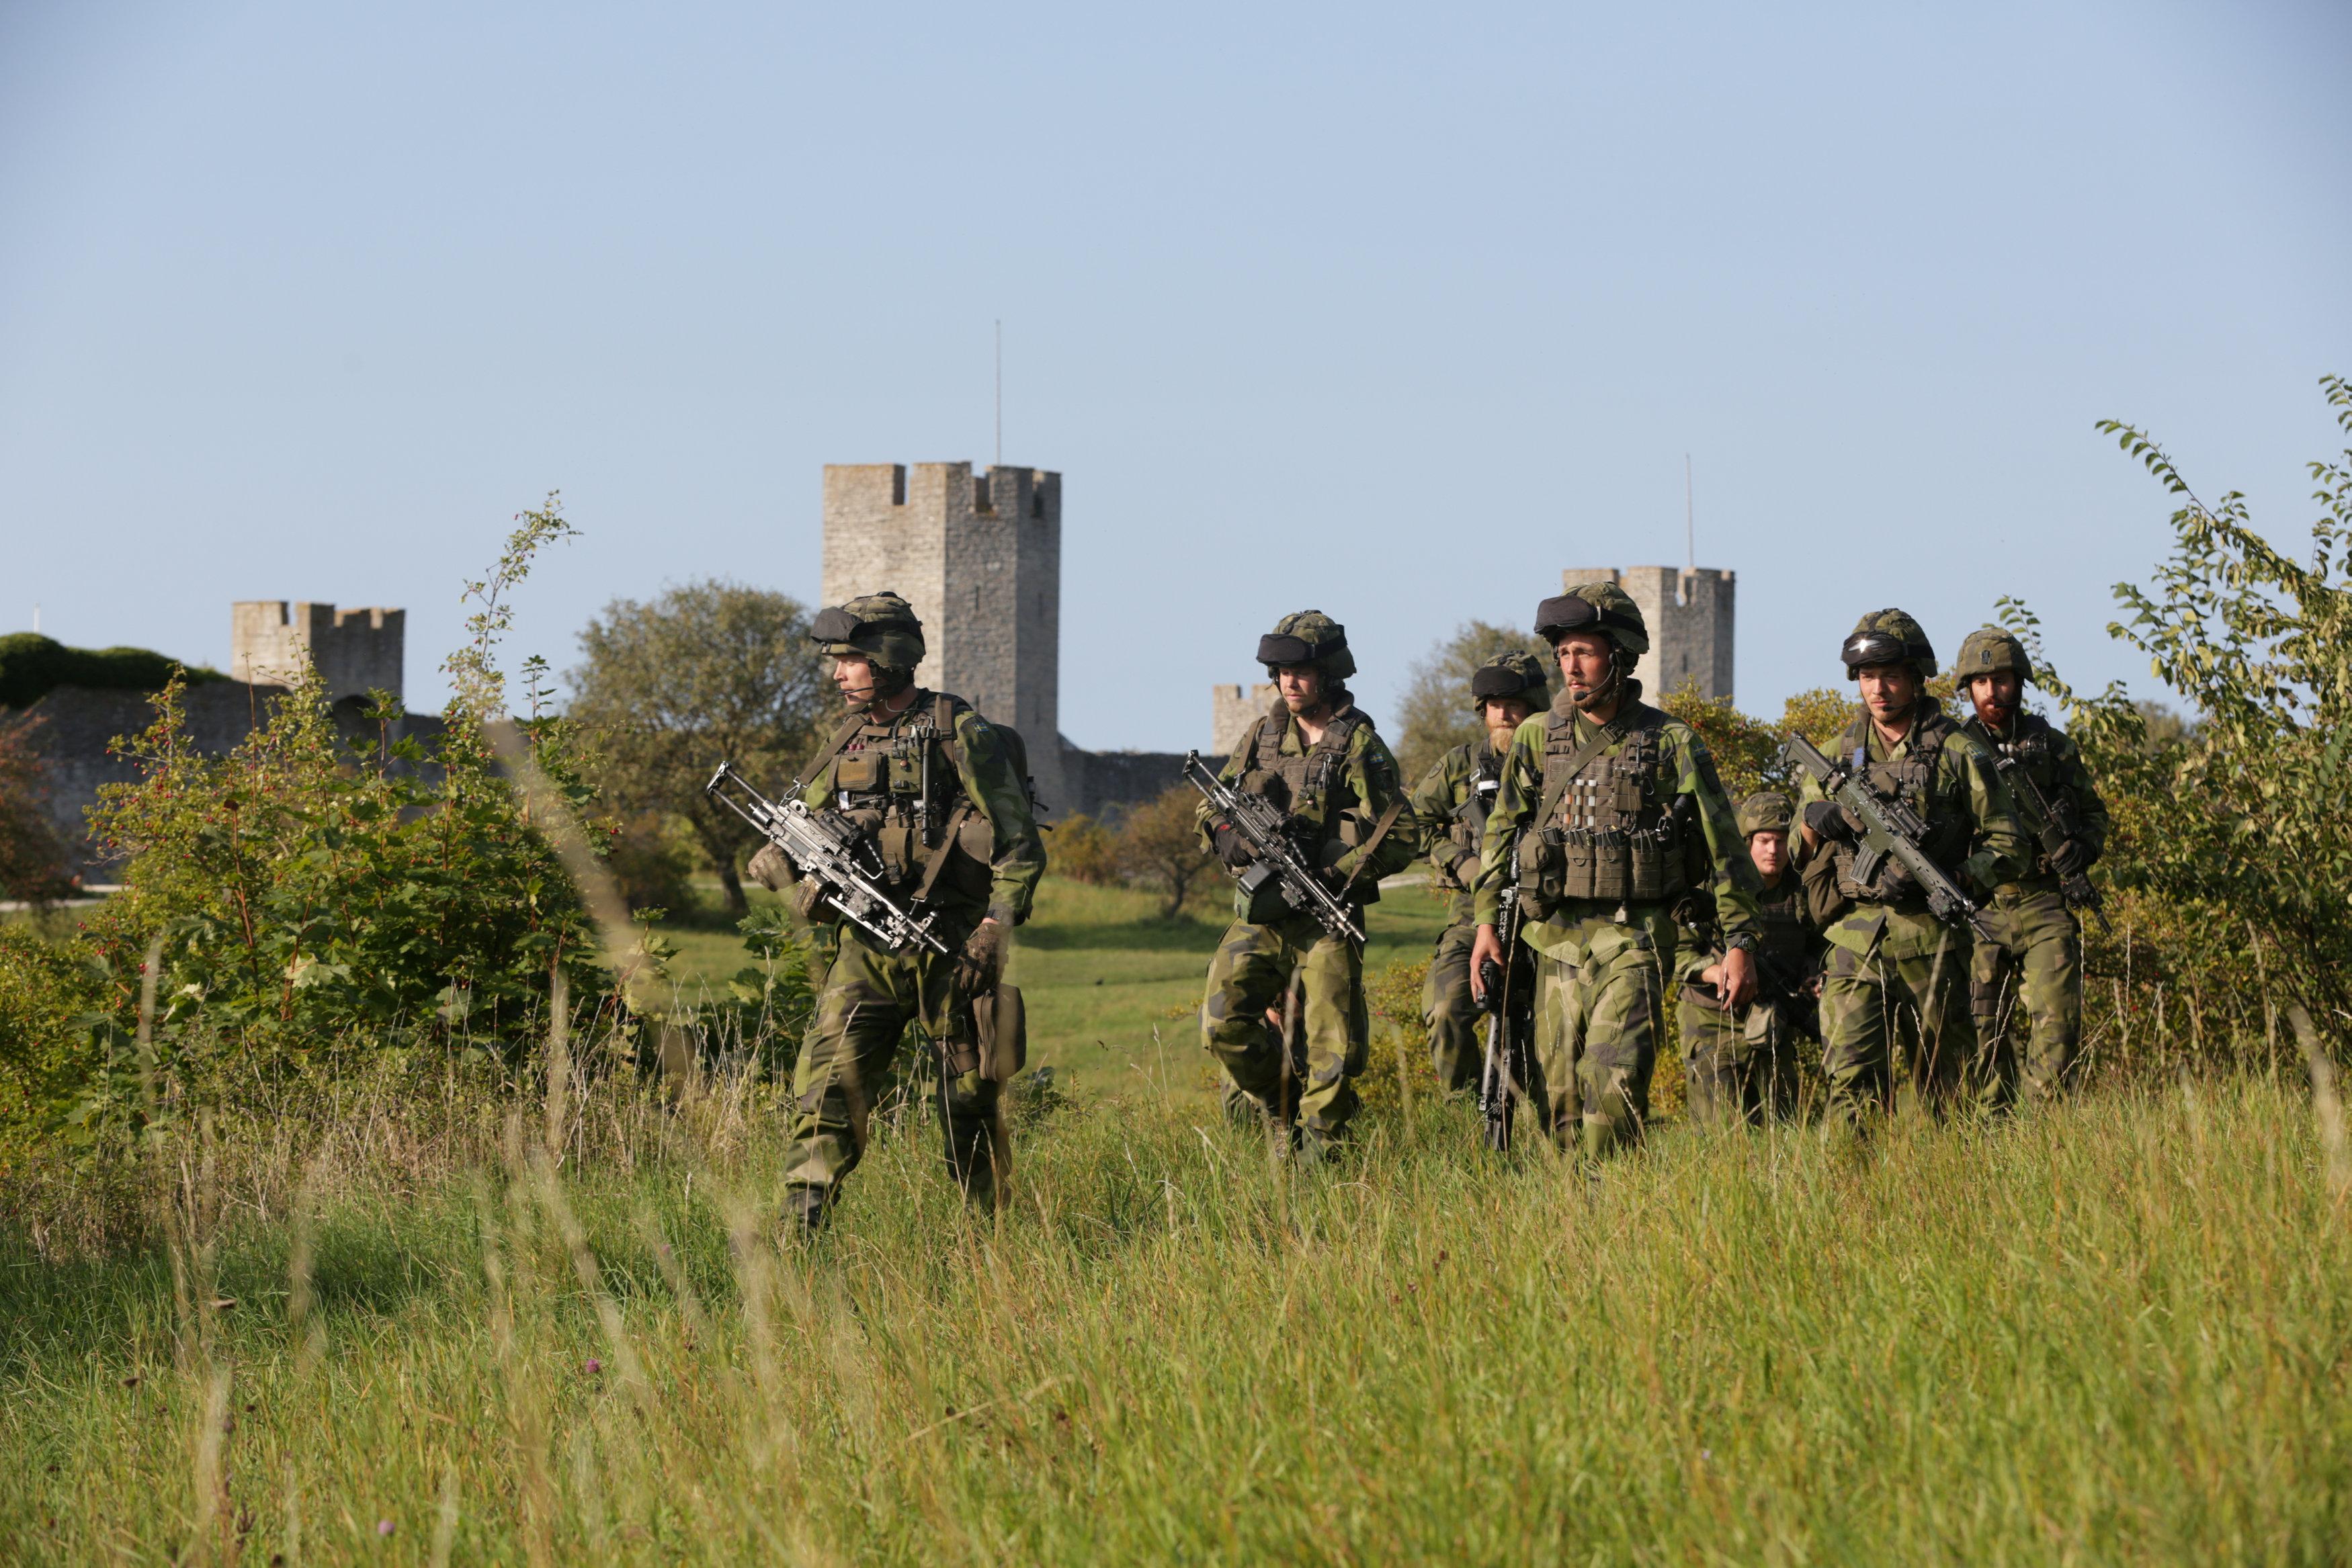 Swedish military patrol outside Visby, island of Gotland, Sweden September 14, 2016. TT News Agency/Soren Andersson/ via REUTERS.